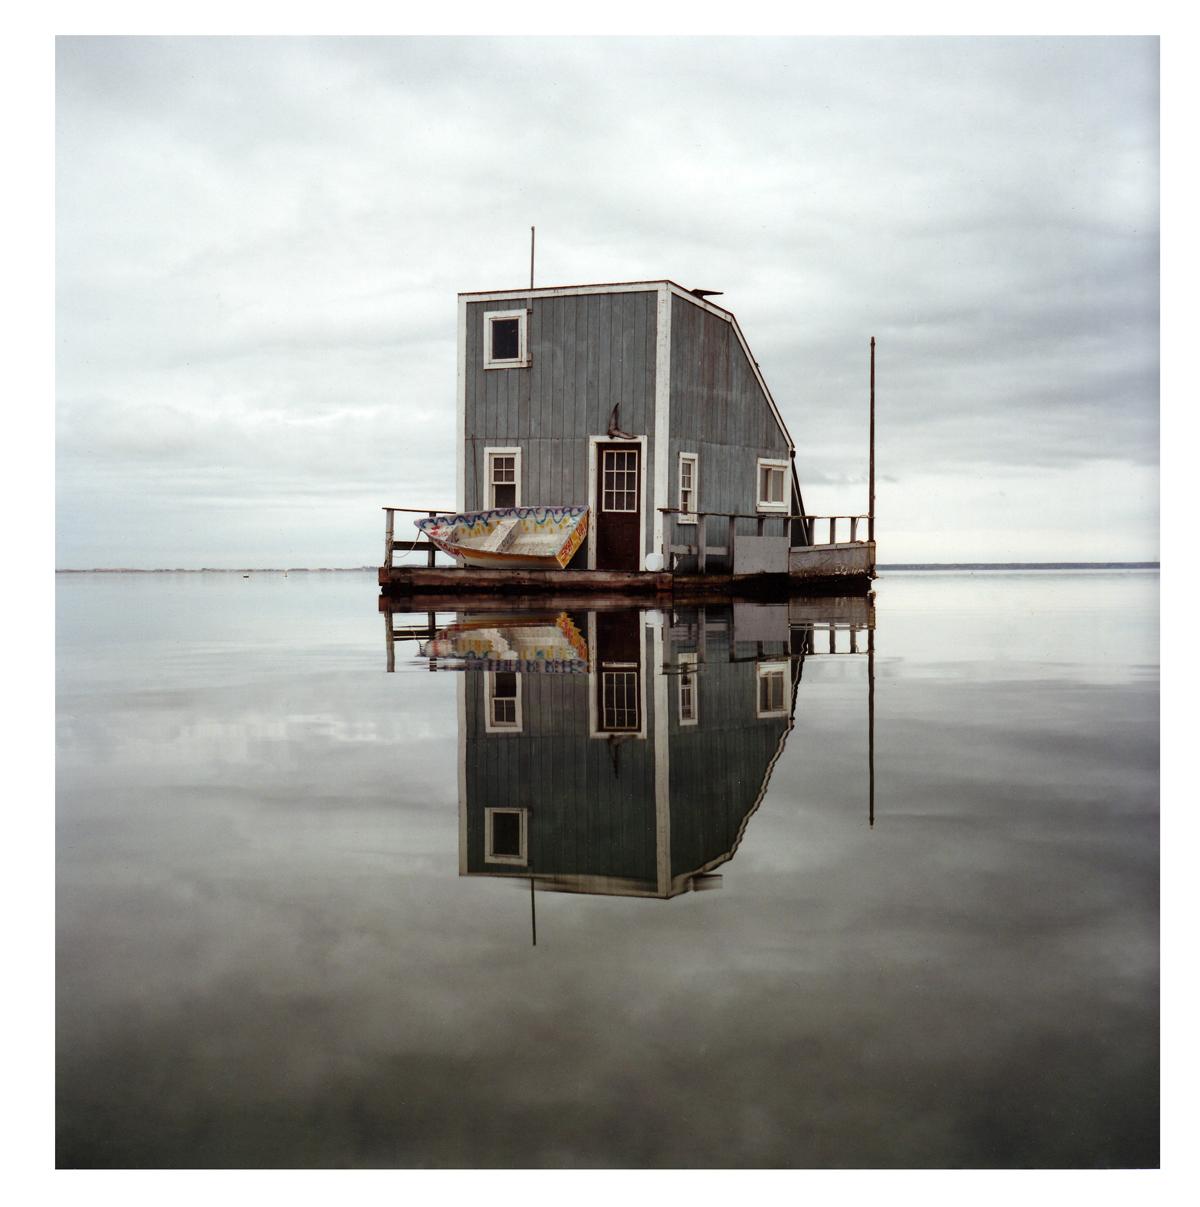 house-boat copy